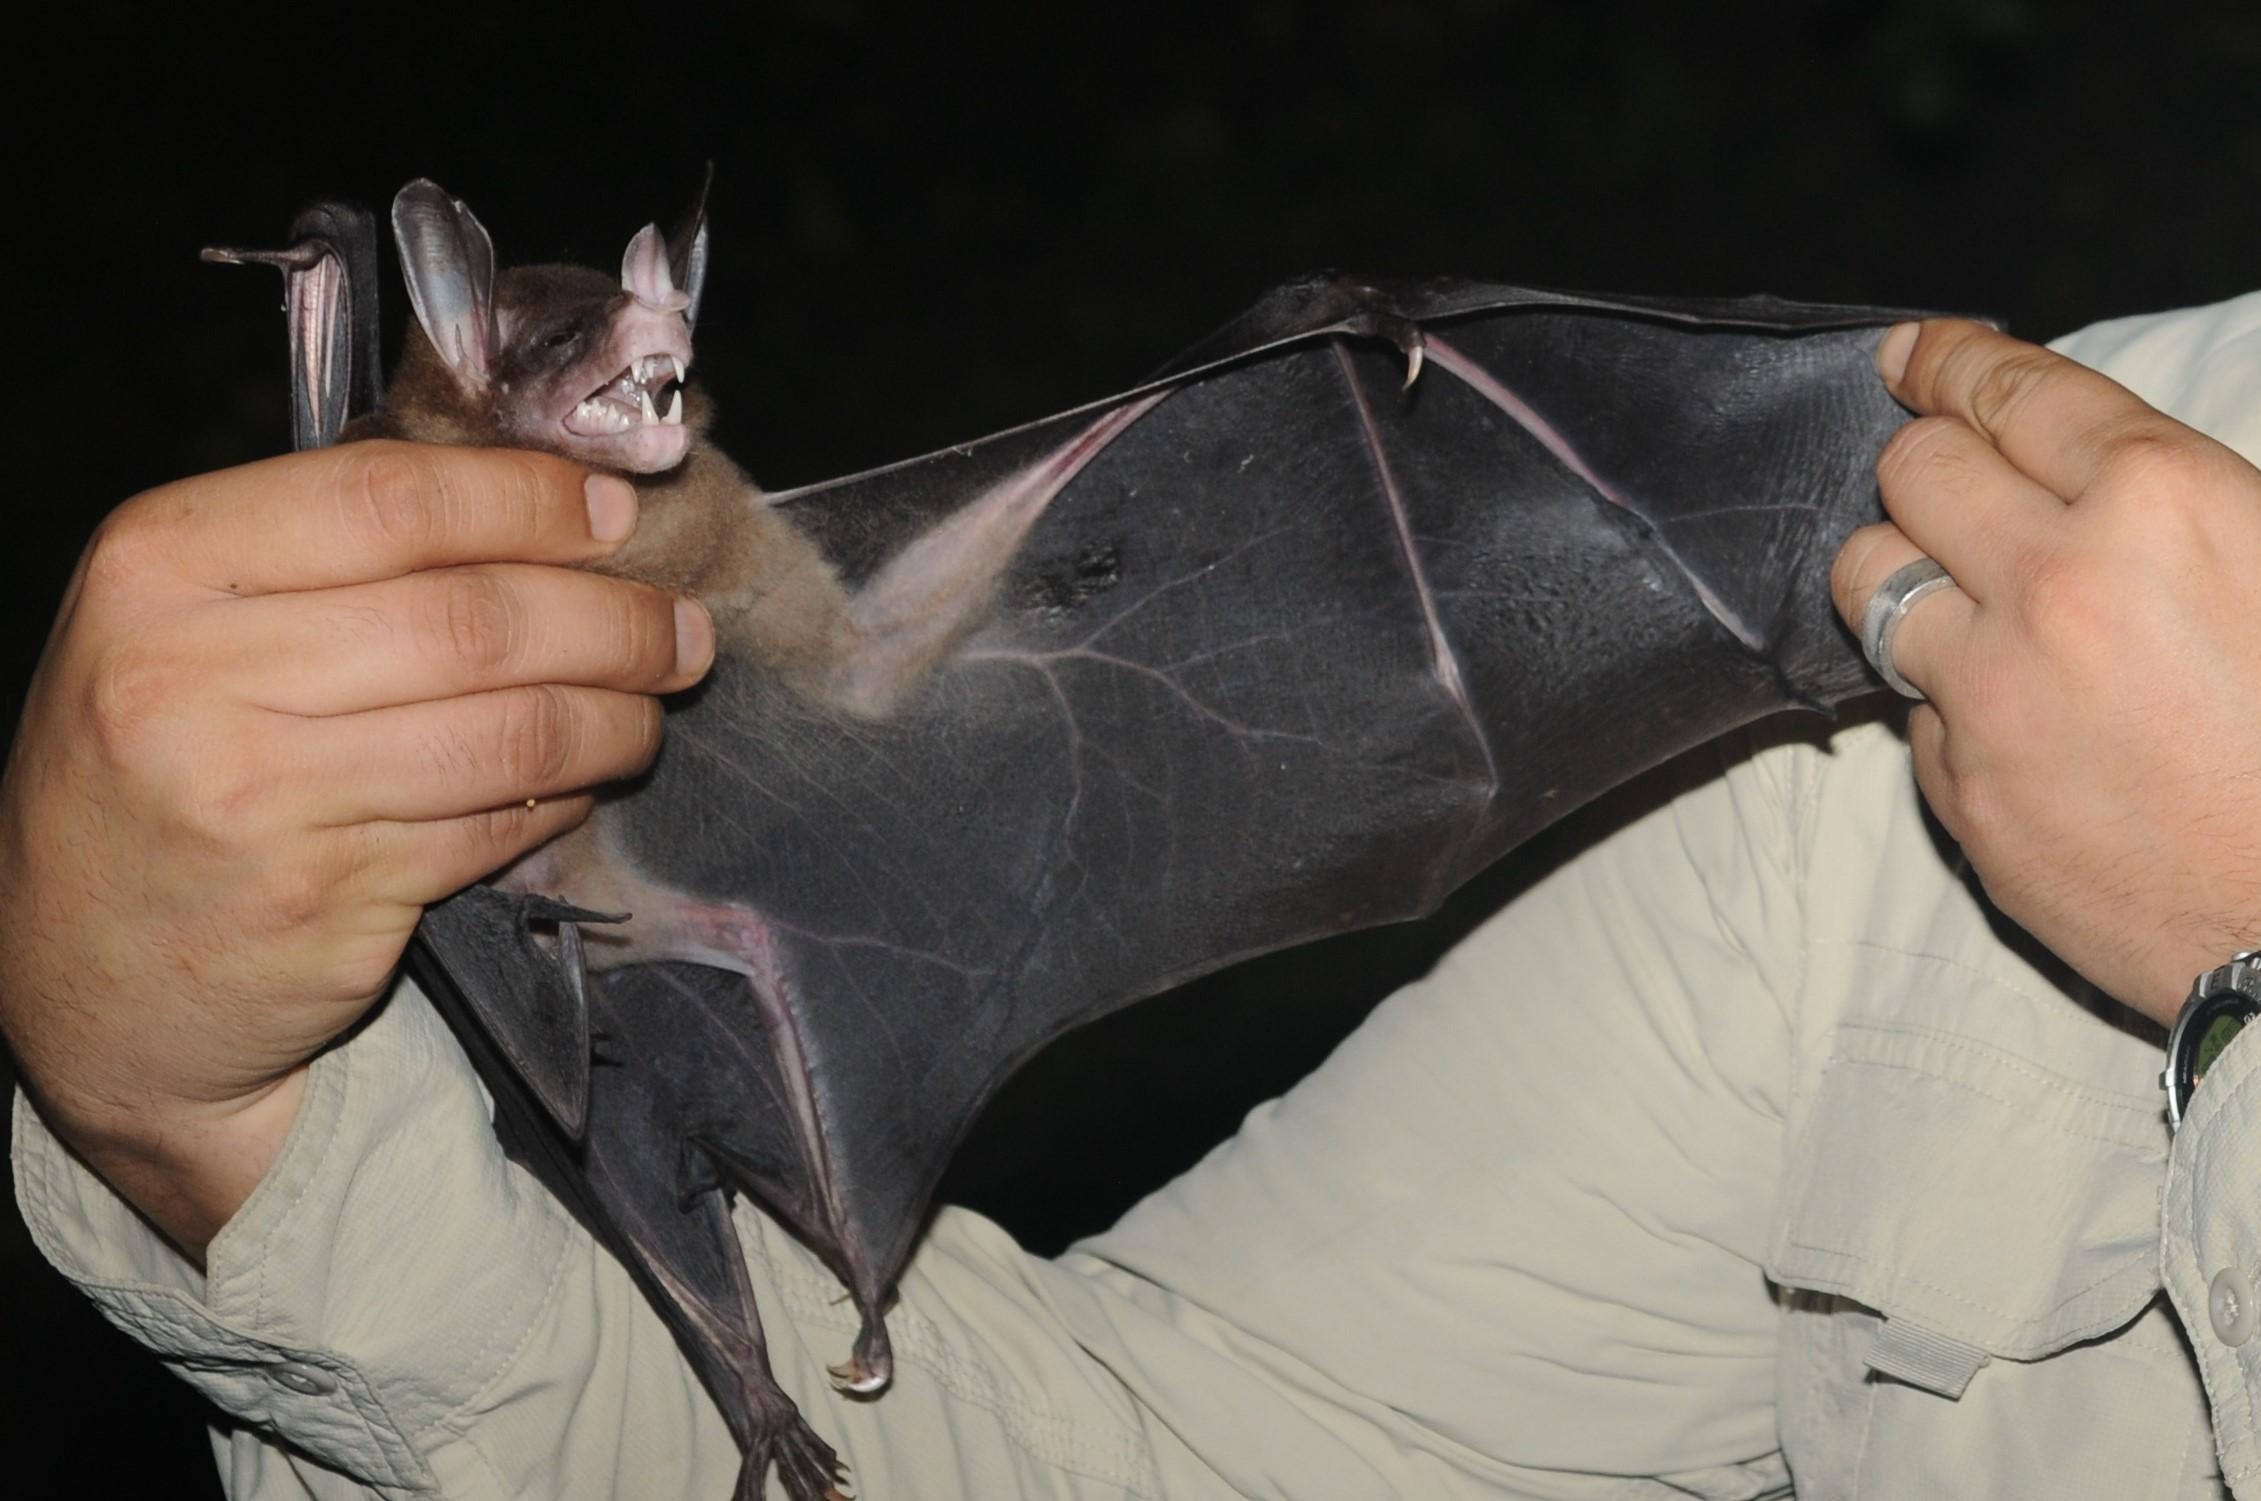 Spectral bat - Wikipedia